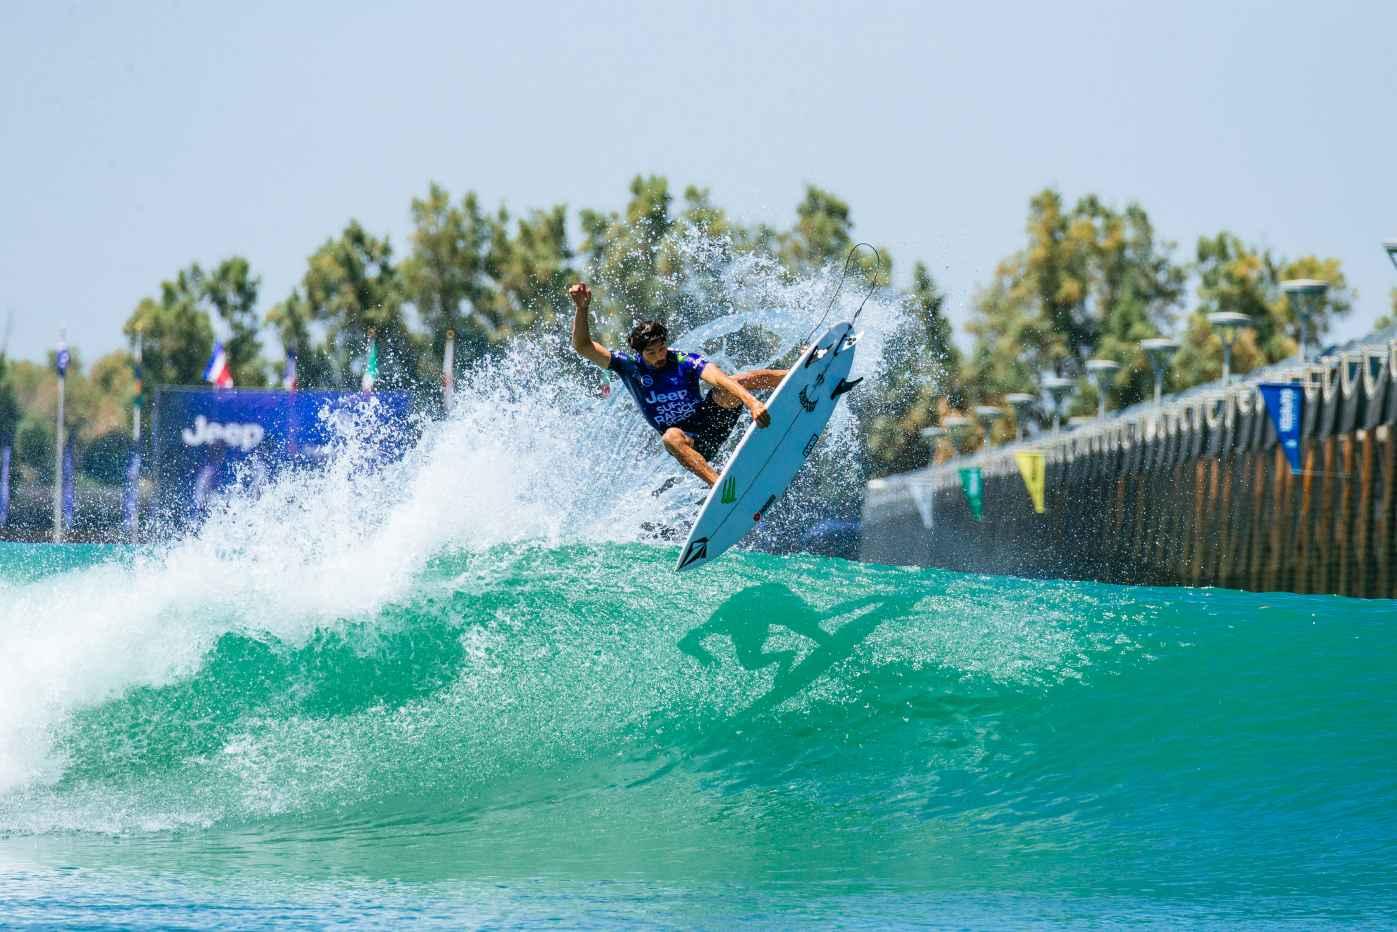 surf30 surf ranch pro 2021 wsl surf Dora Y Ranch21 JVK 4693